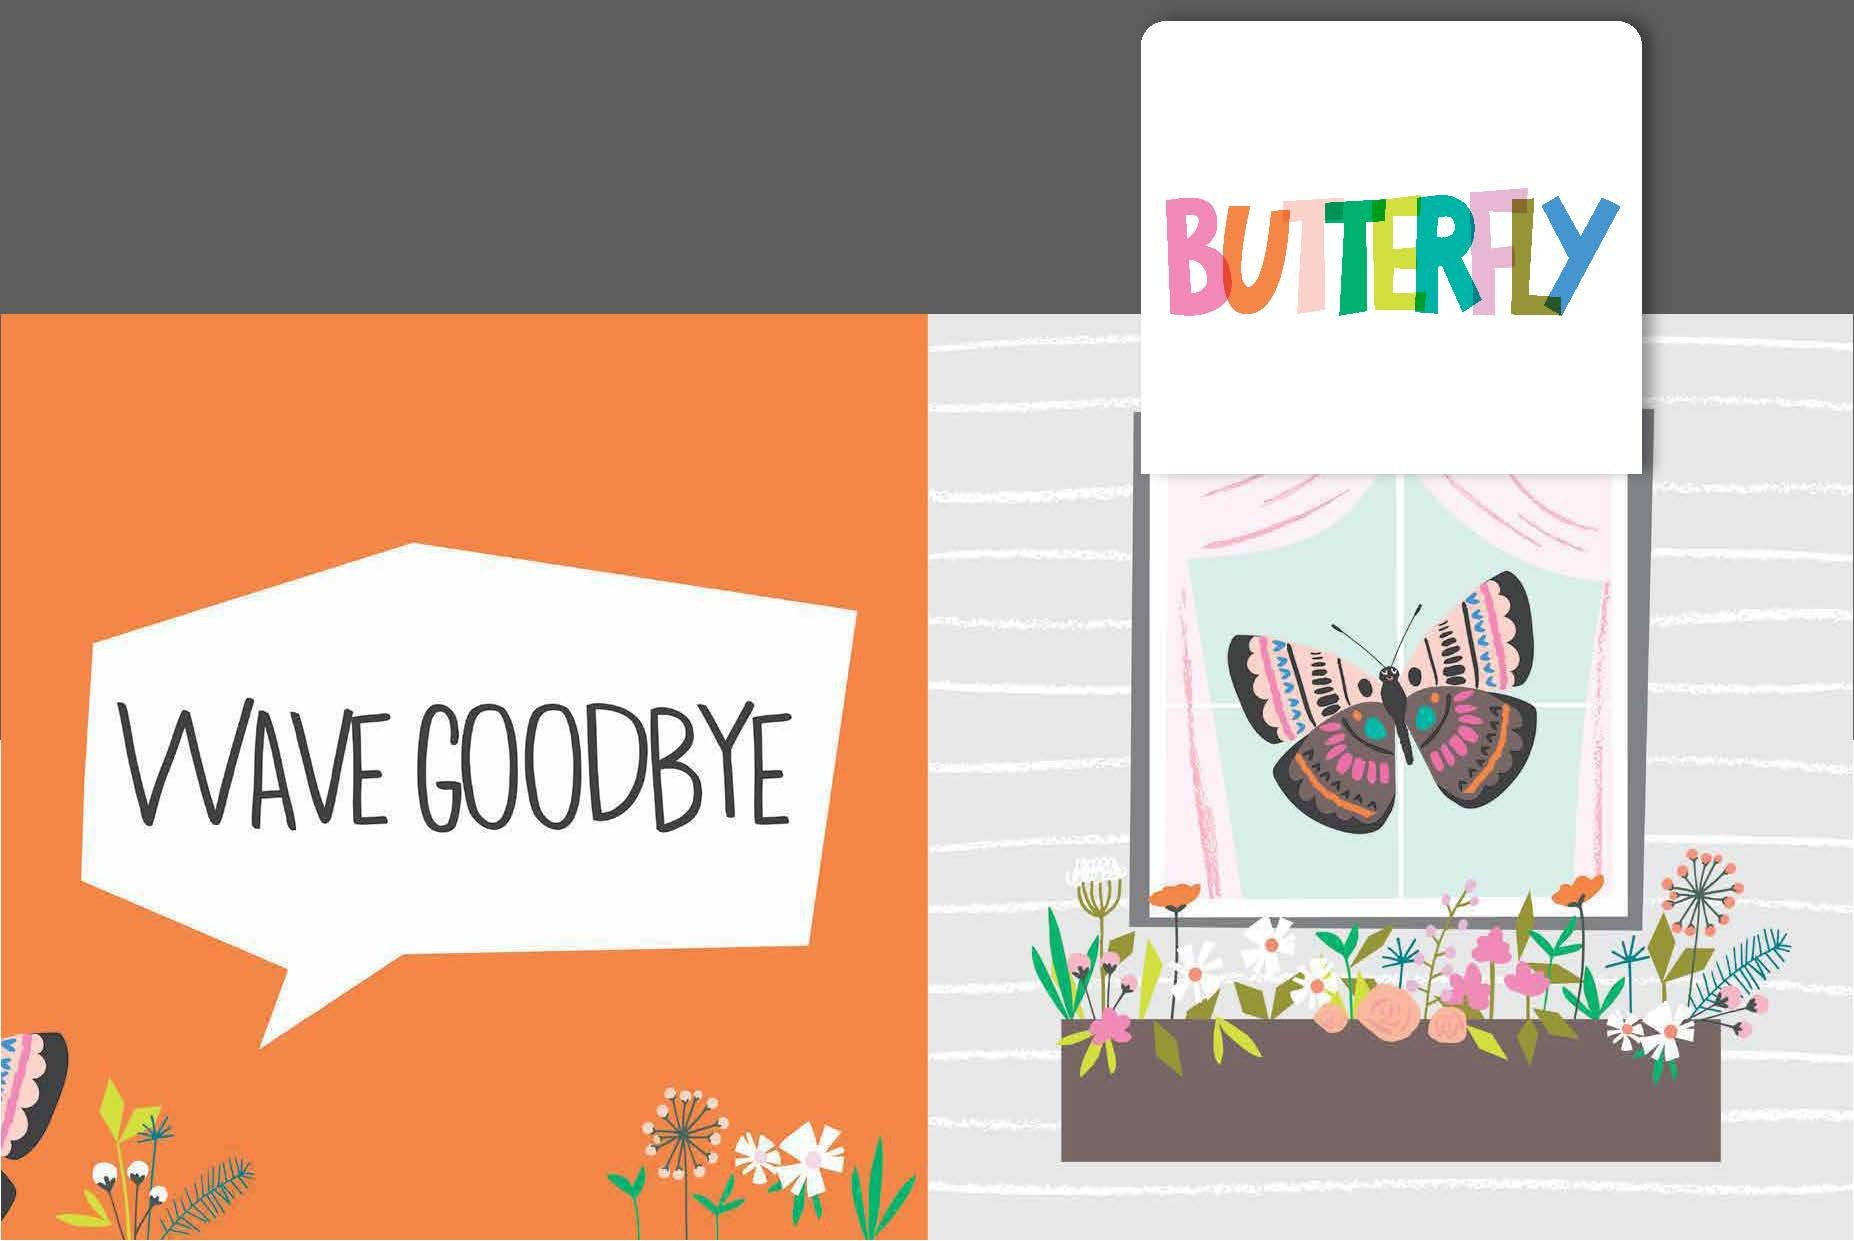 Gotta Go, Buffalo: A Silly Book of Fun Goodbyes (BabyLit)